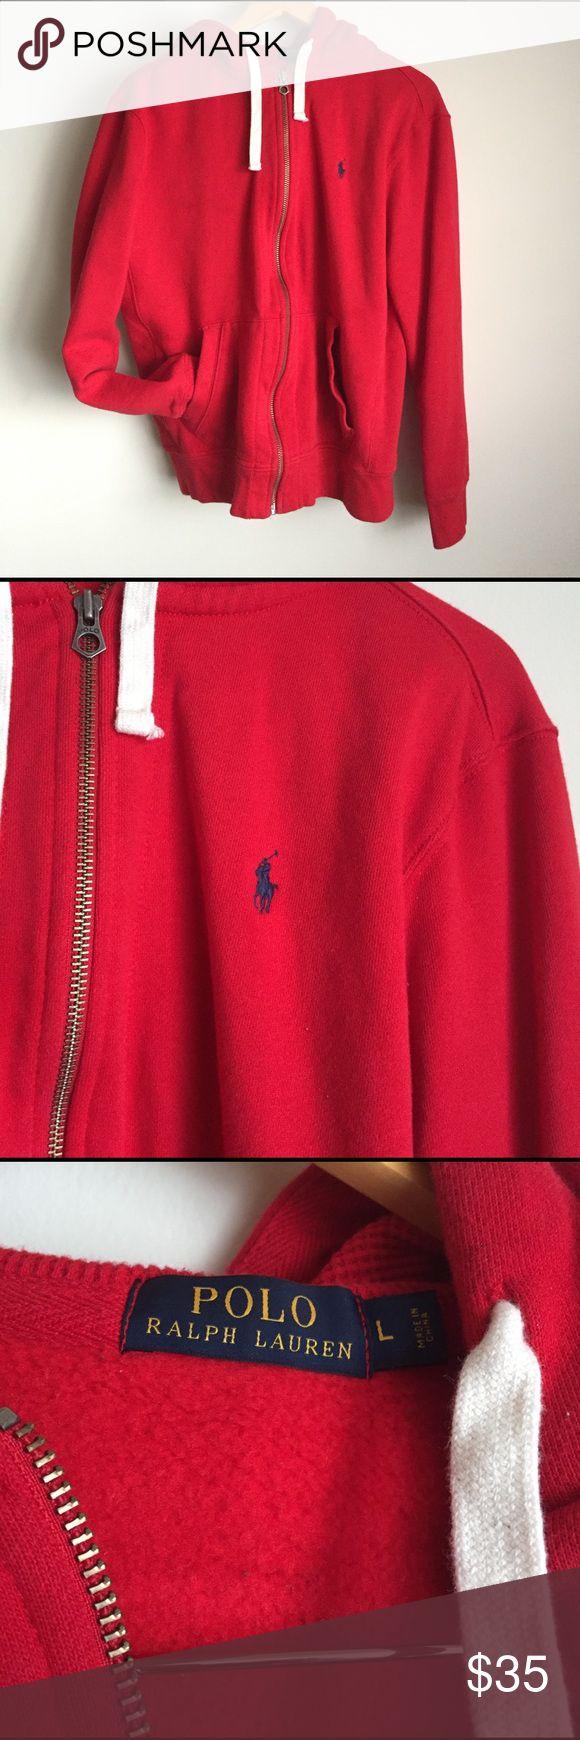 RALPH LAUREN POLO Red Zip Up Hoodie MENS • Gently worn • great condition • RALPH LAUREN POLO Red Zip Up Hoodie With a Blue Logo and Fleece lining • bundle discount offered Ralph Lauren Sweaters Zip Up